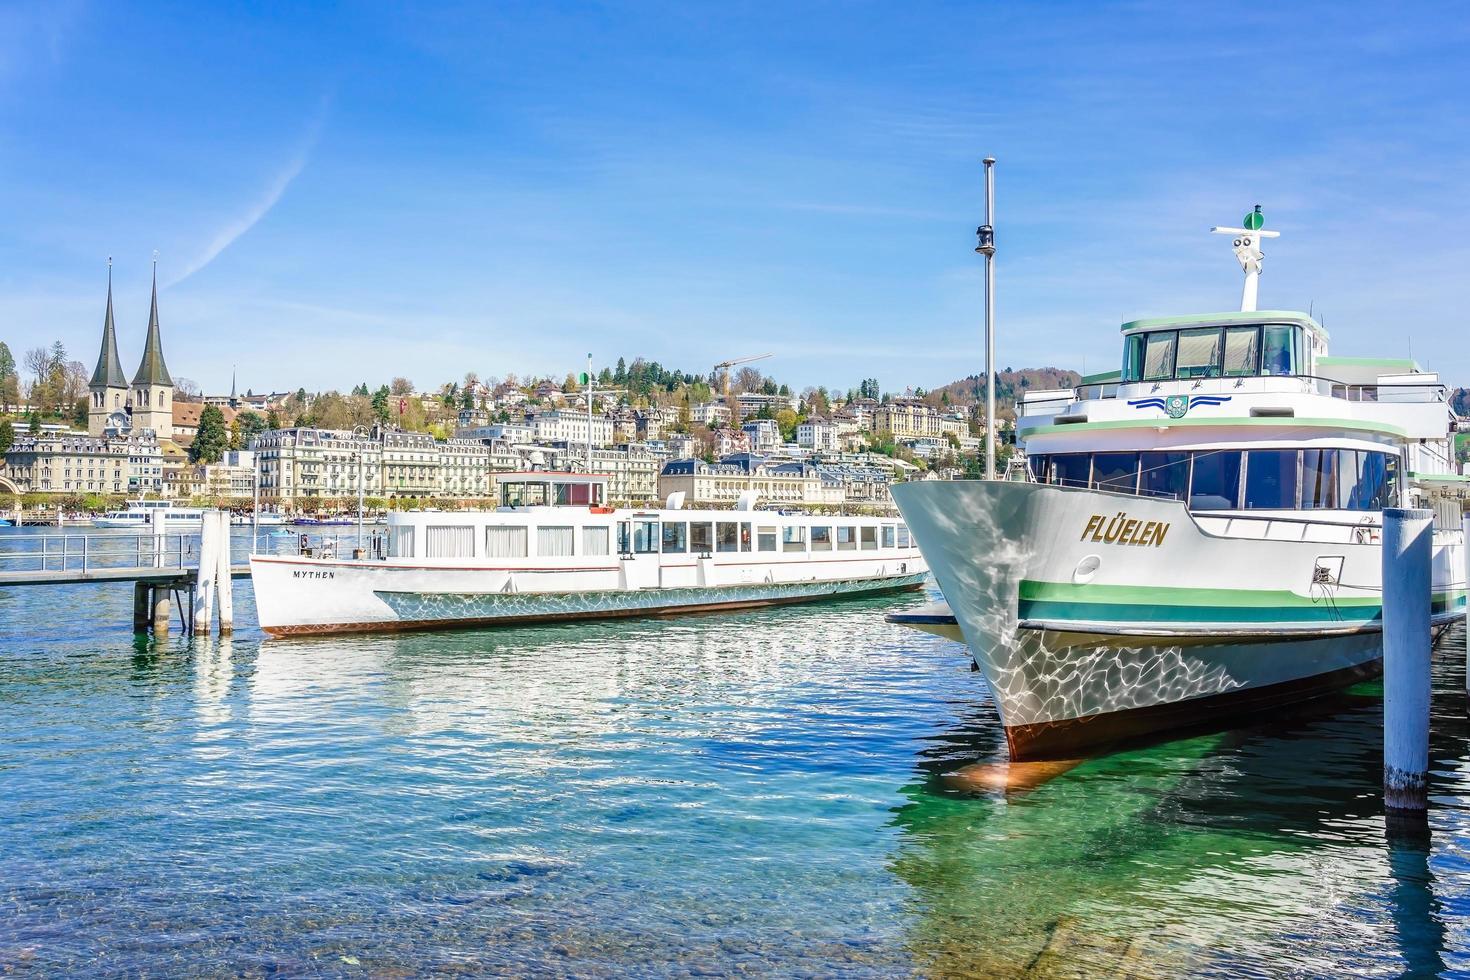 barcos en luzern, suiza, 2018 foto